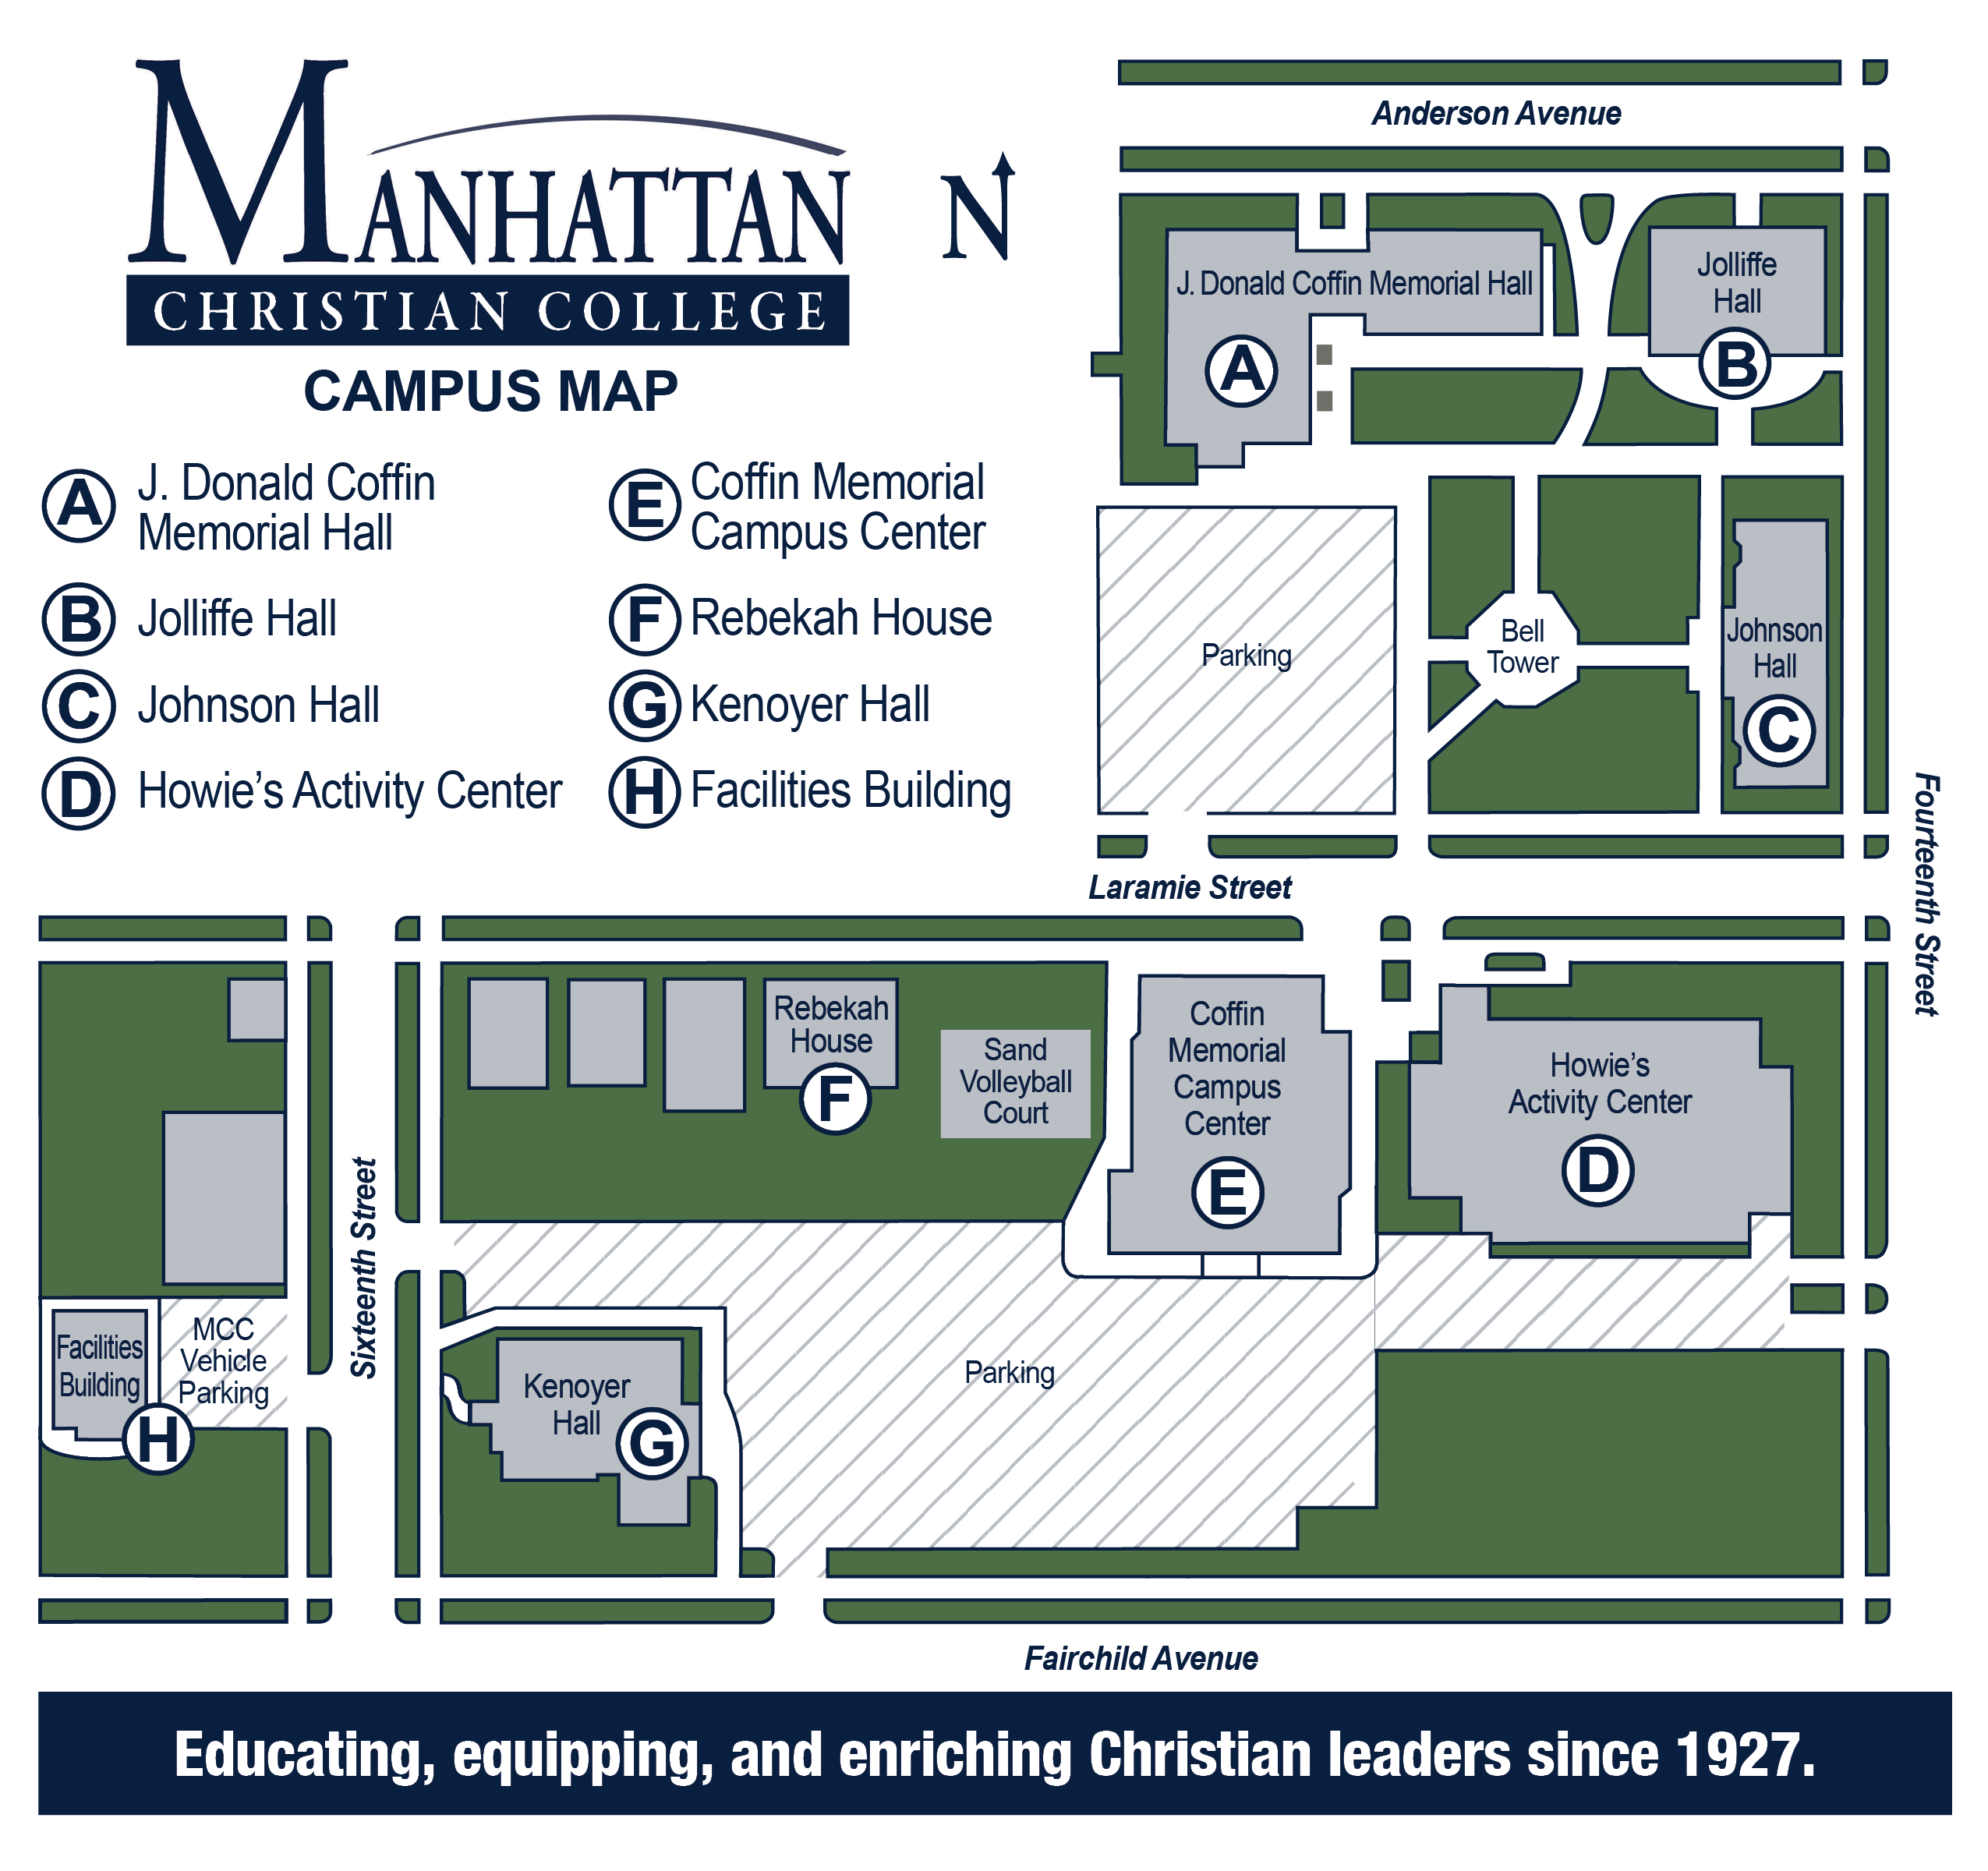 Manhattan College Campus Map Map of Manhattan Christian College's Campus | Manhattan, Kansas